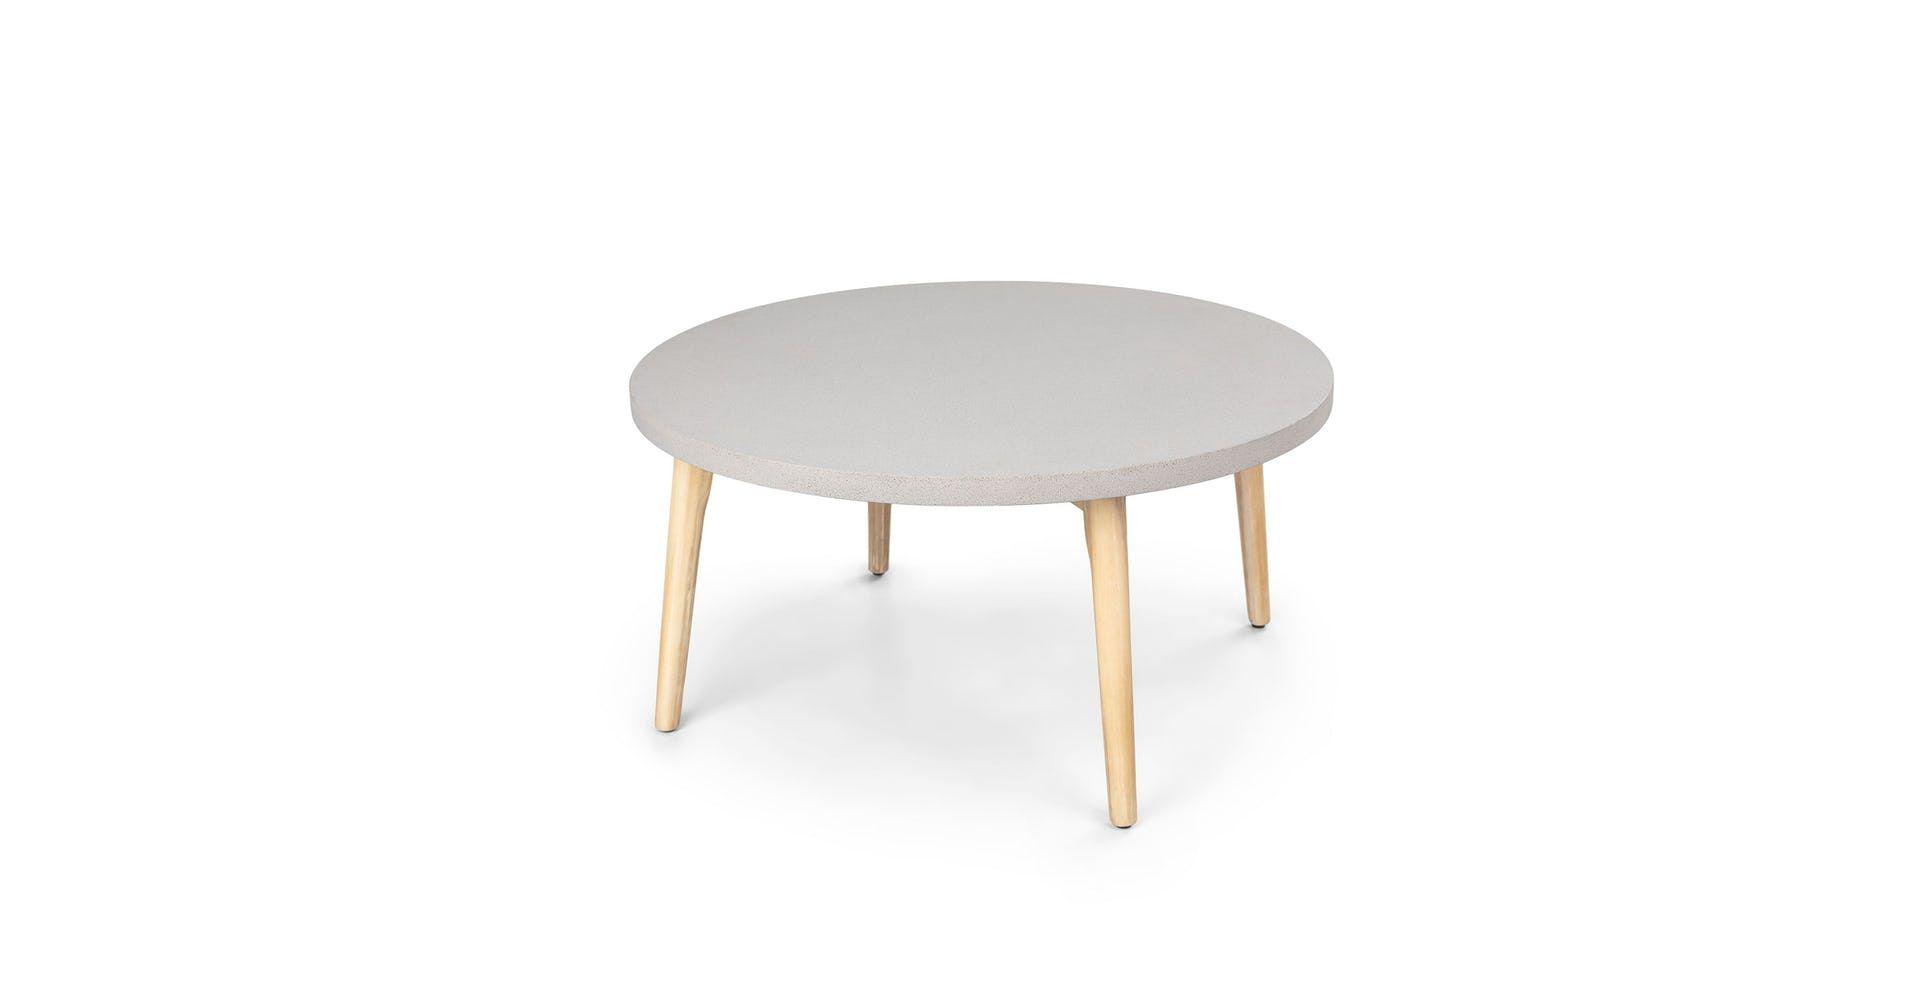 Atra Concrete Round Coffee Table Coffee Table Mid Century Modern Coffee Table Round Coffee Table [ 997 x 1920 Pixel ]